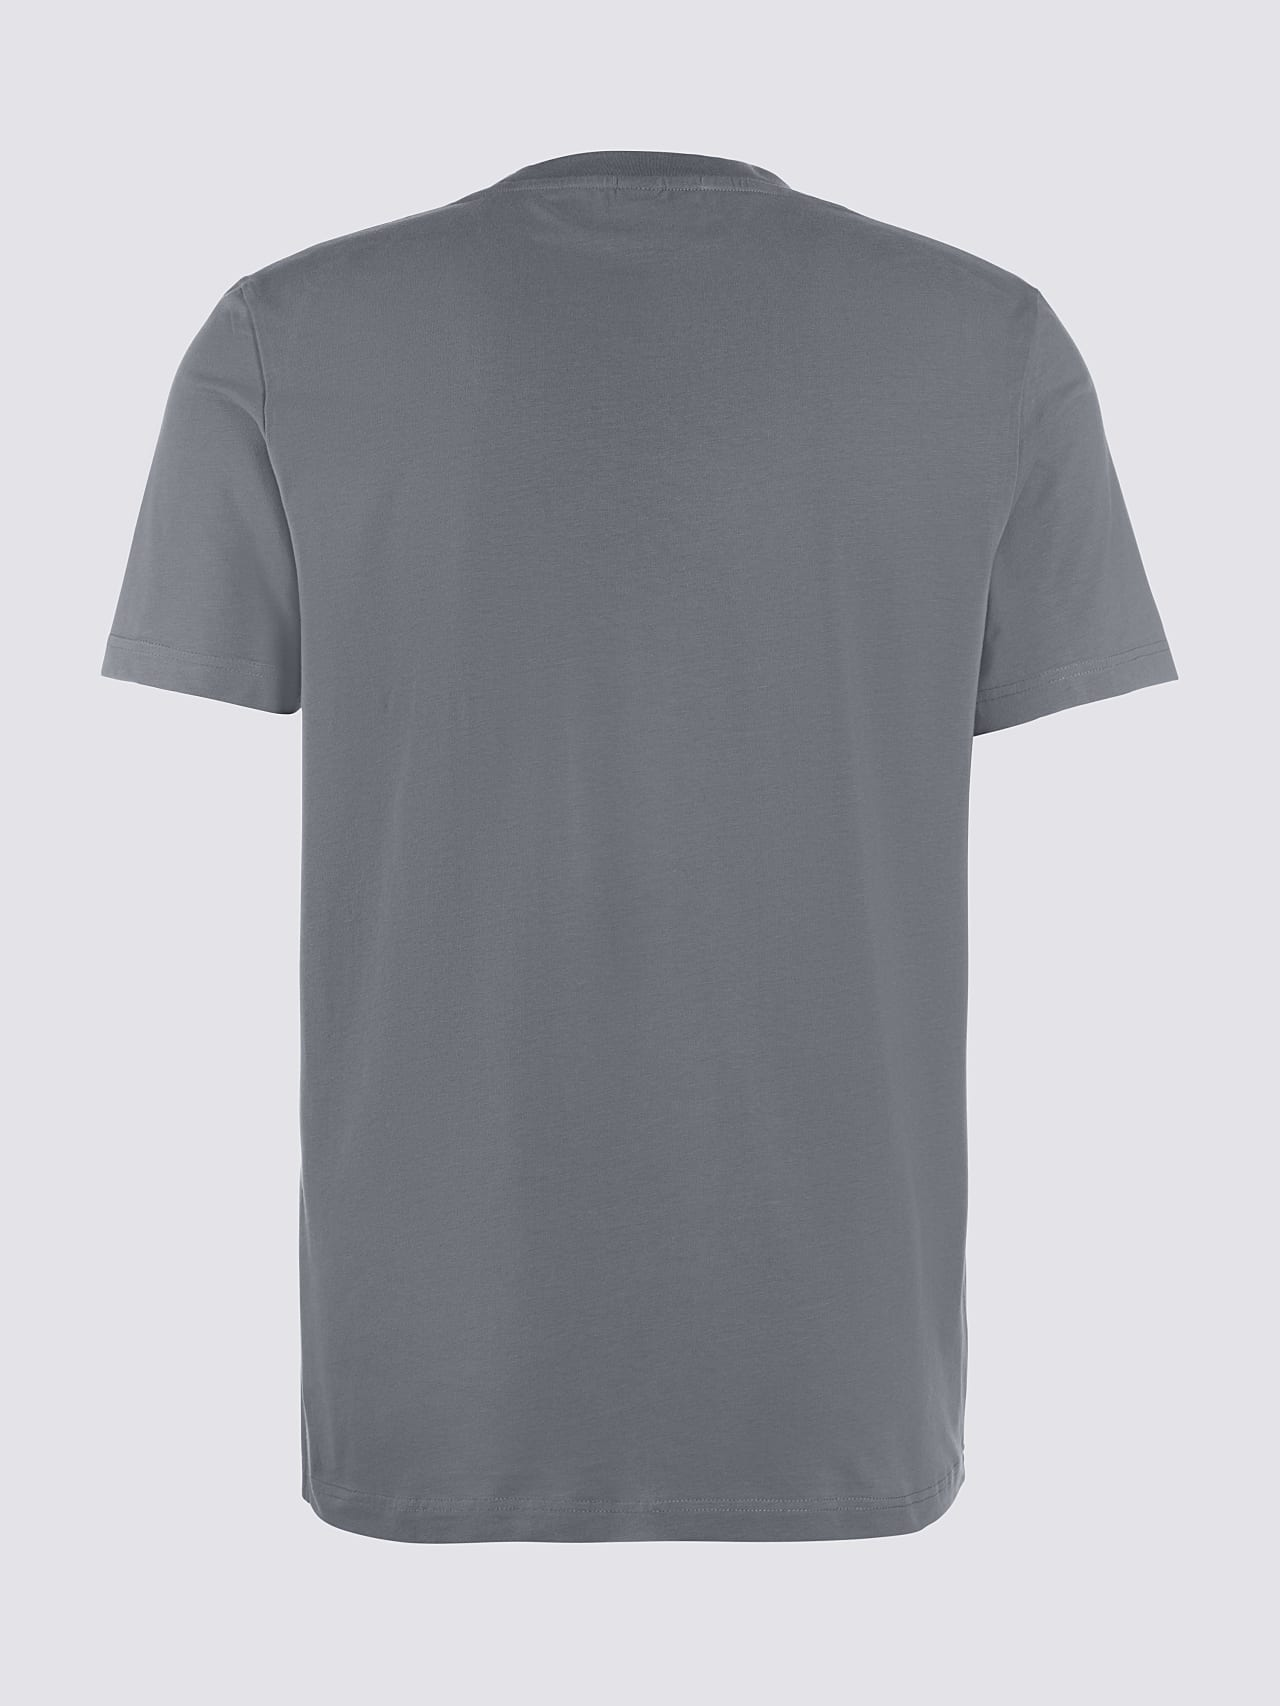 JERO V2.Y4.02 Signature Logo T-Shirt Grey Left Alpha Tauri